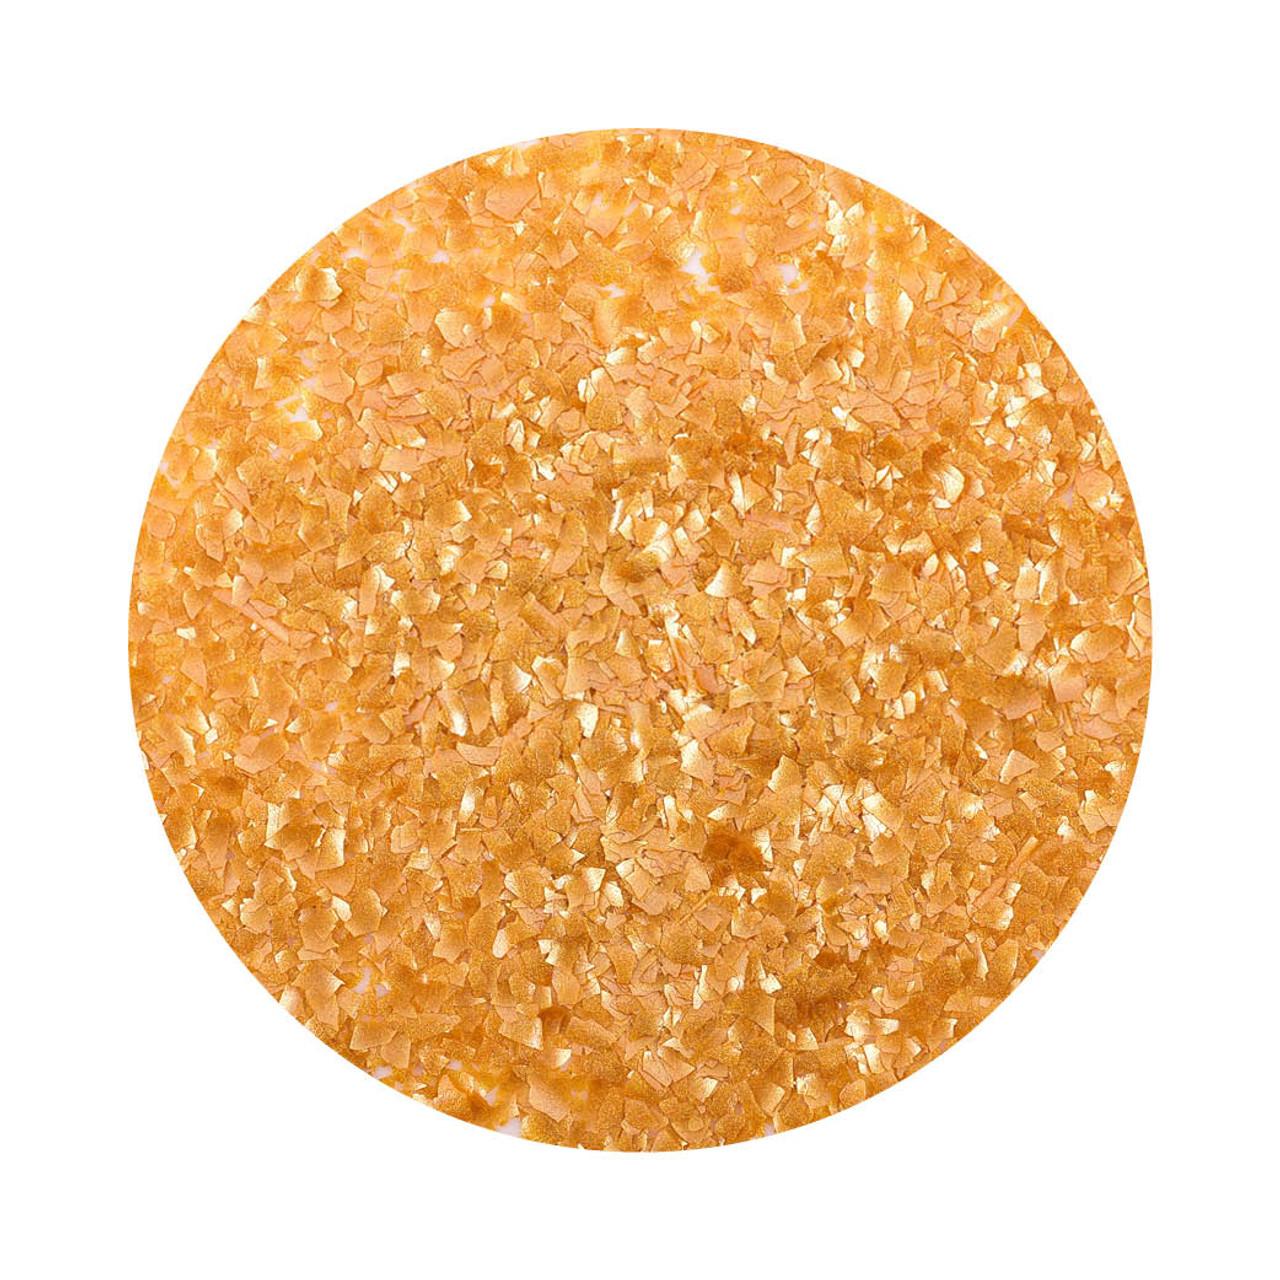 Bulk 200g -  Edible Crafting Glitter - Gold